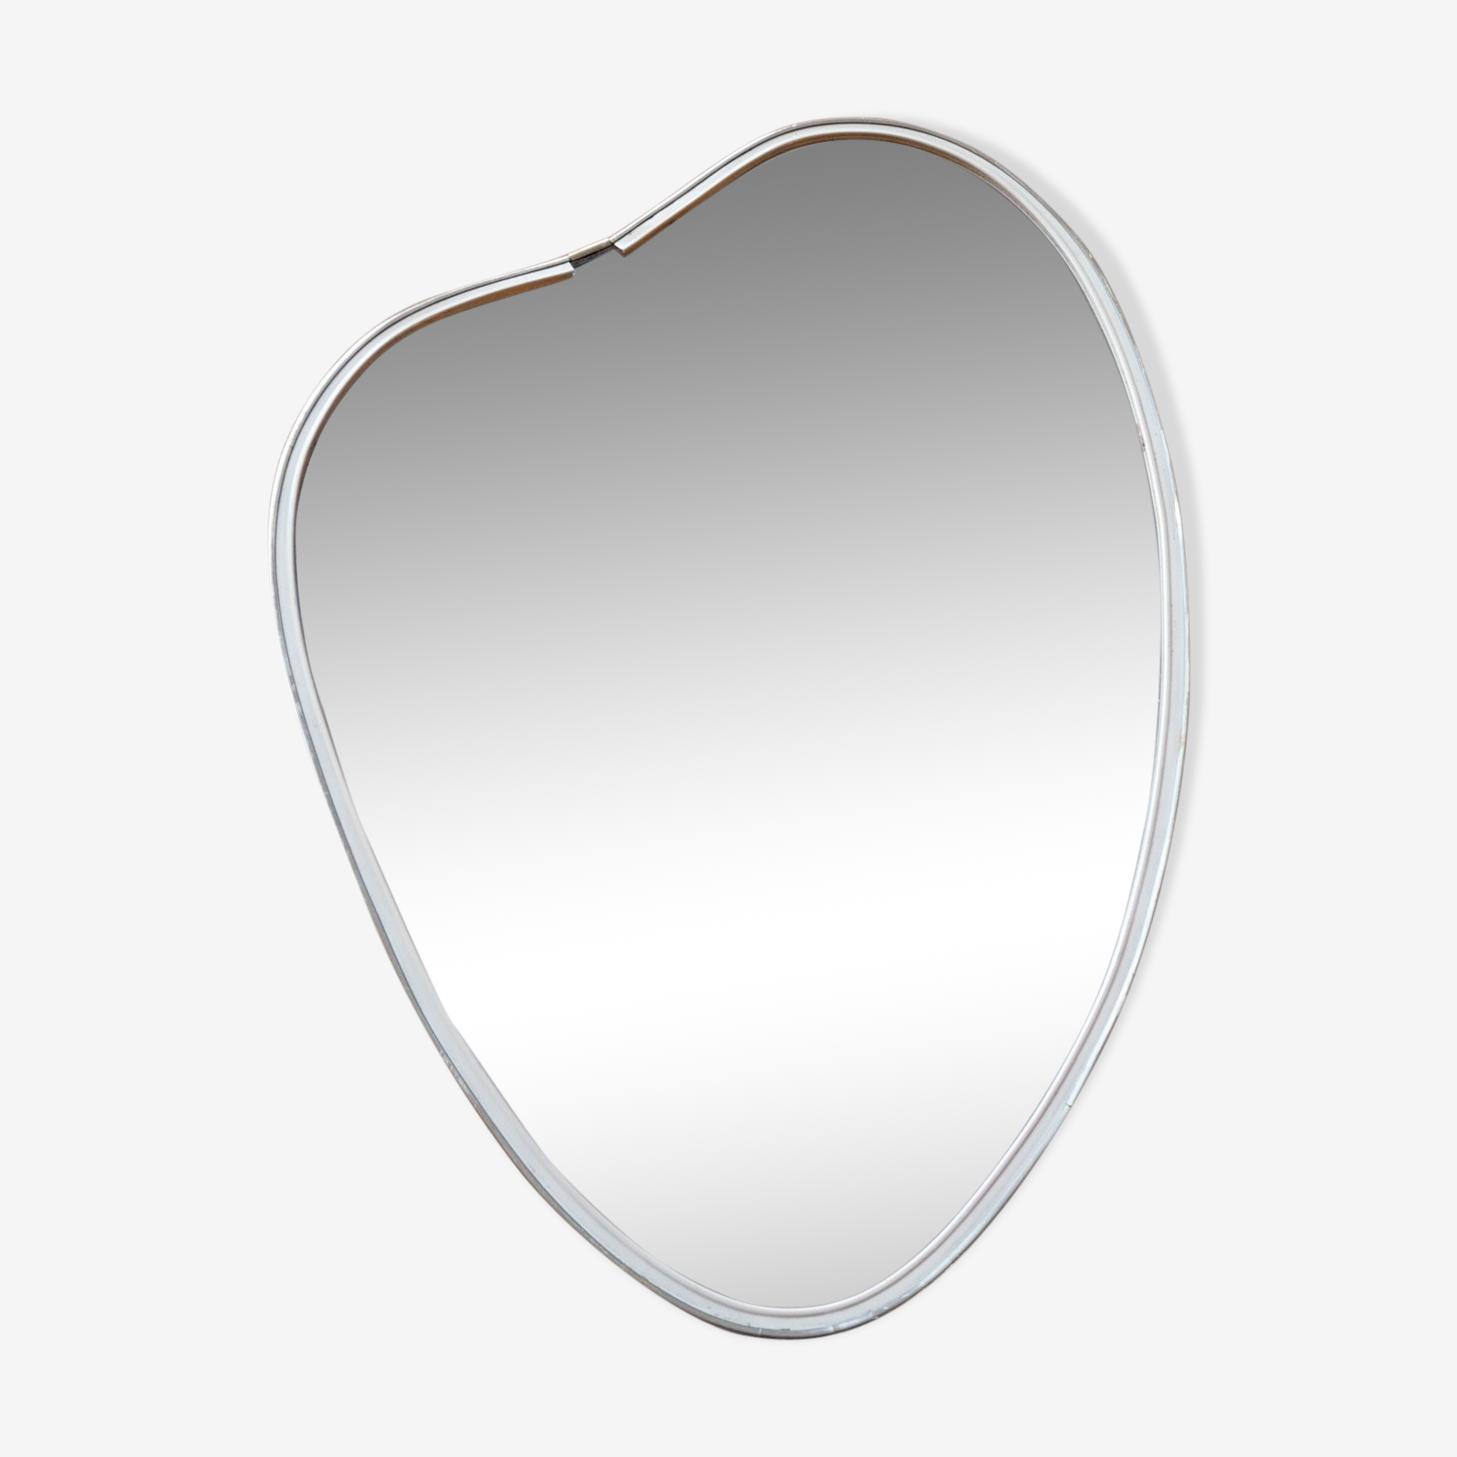 Vintage asymmetric vintage mirror 38x54cm